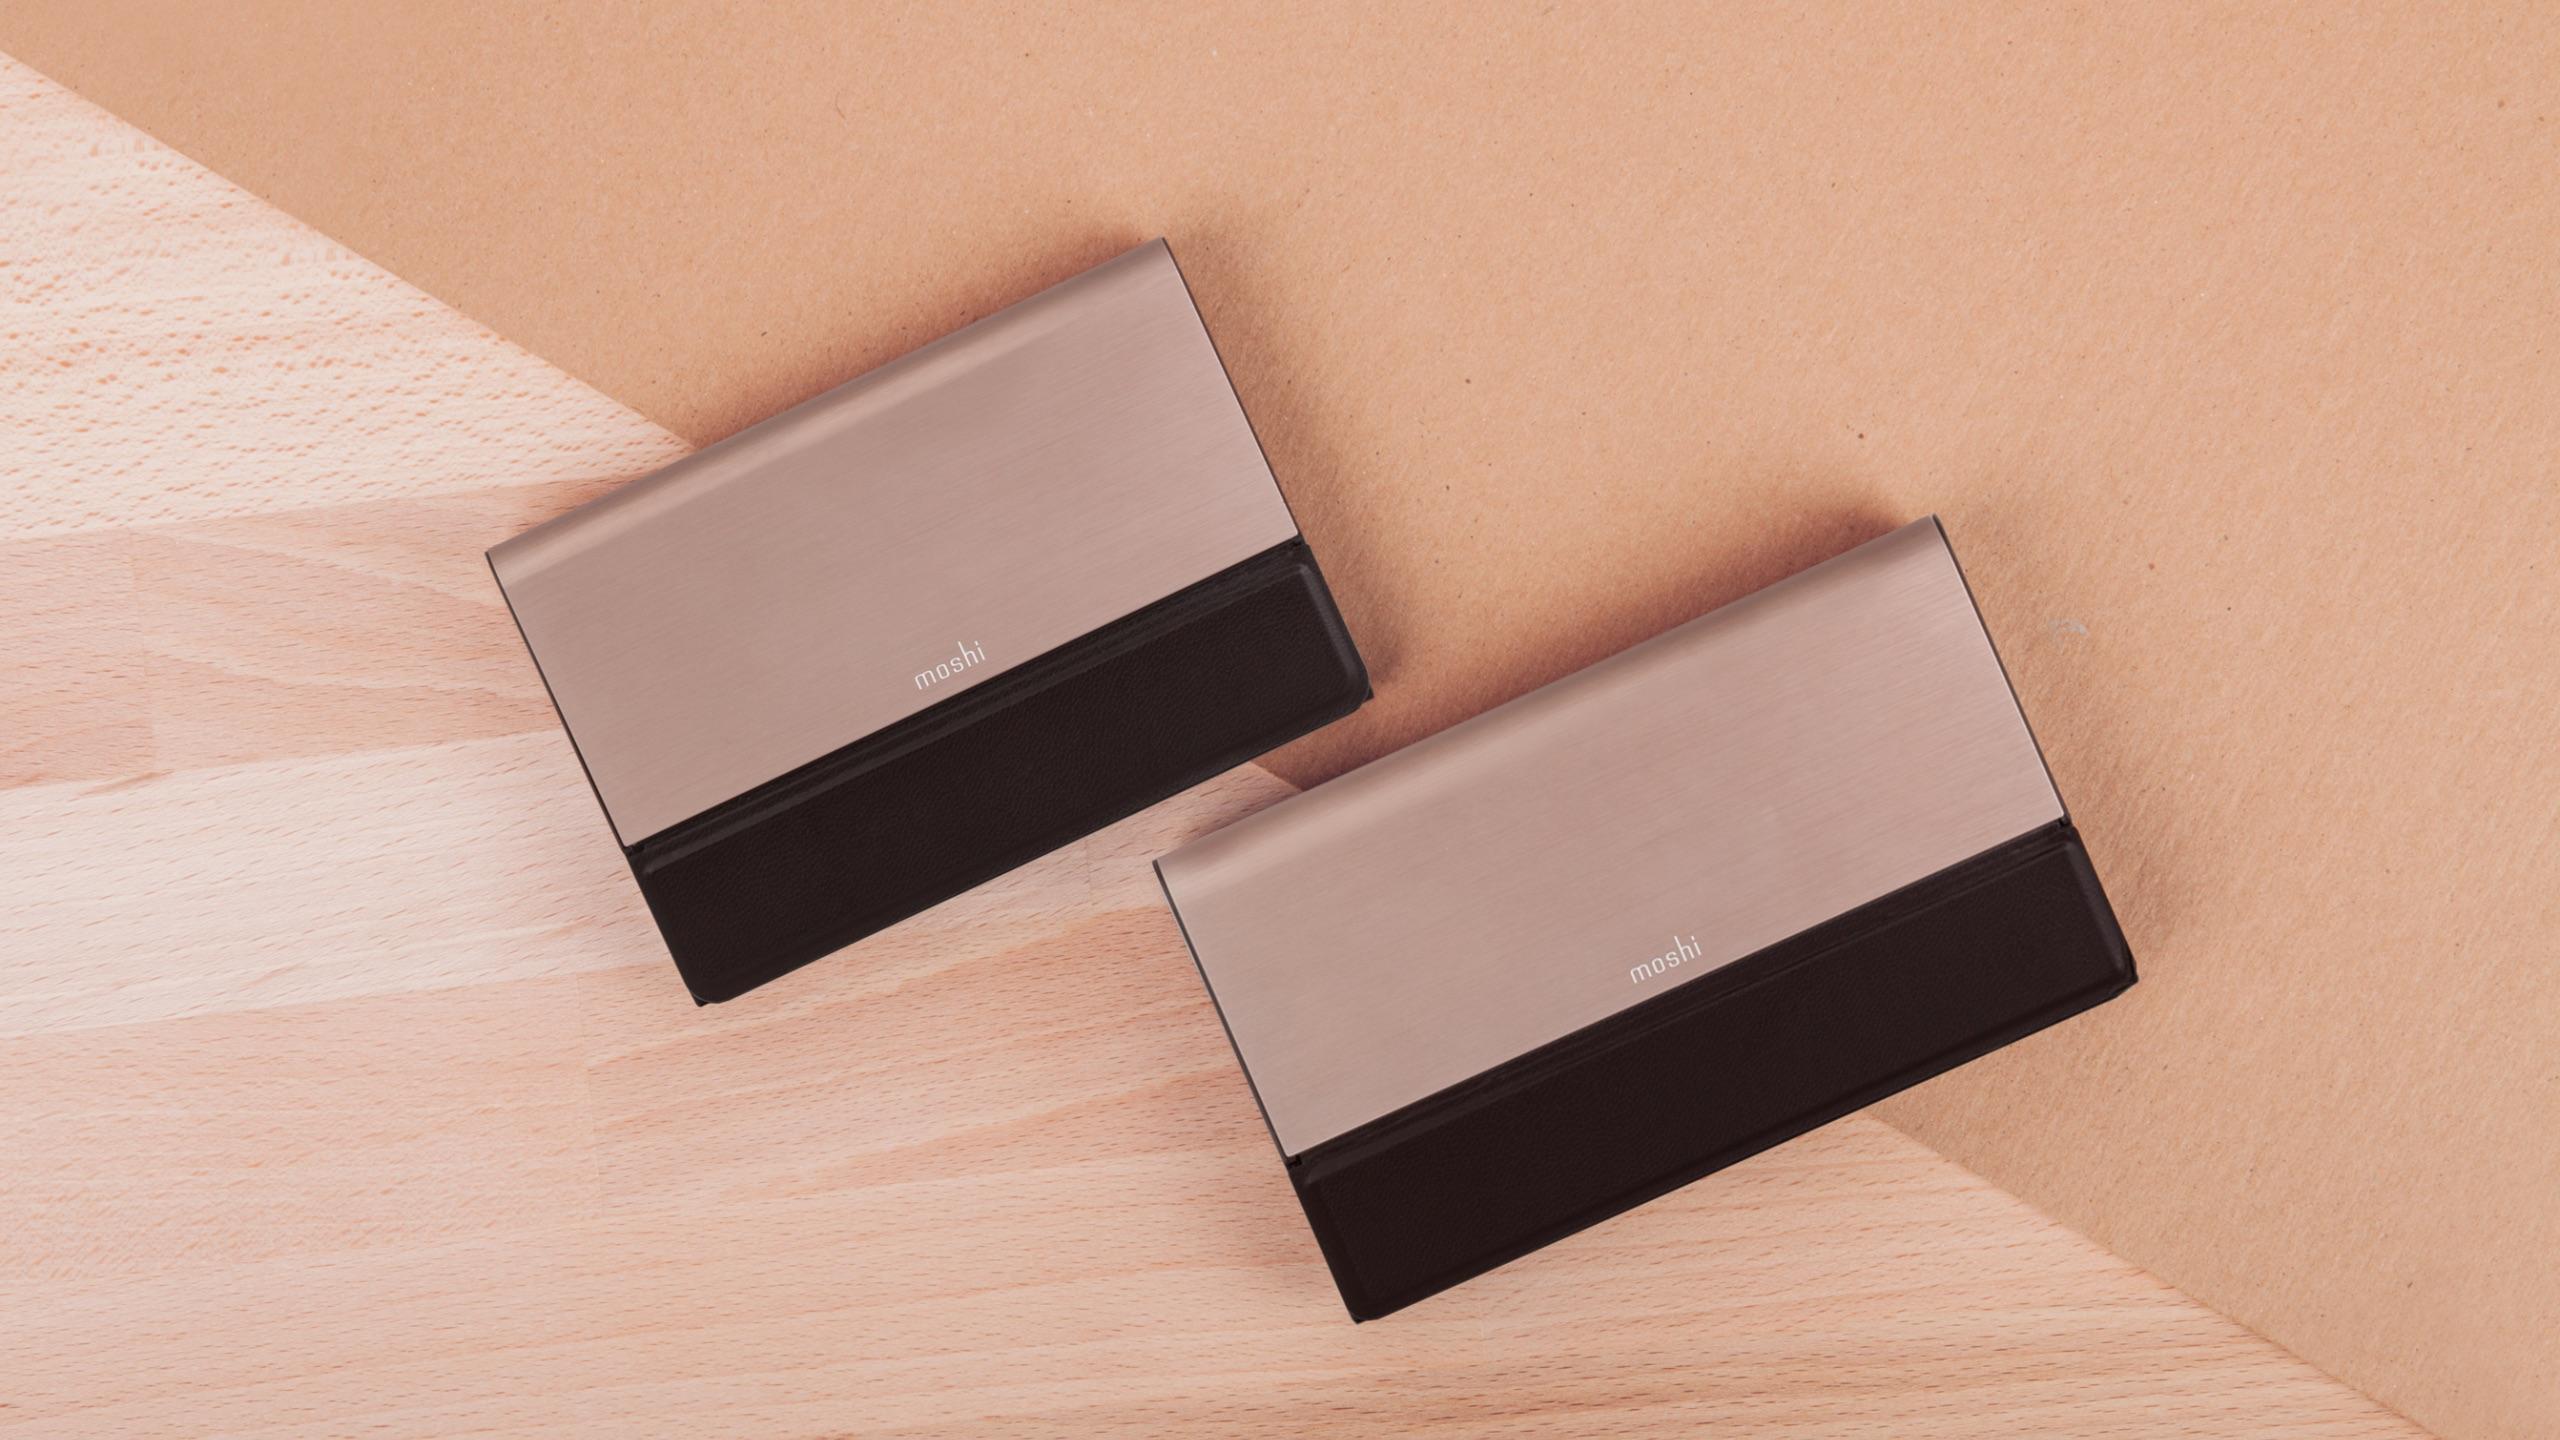 IonBank 10K Portable Battery-image